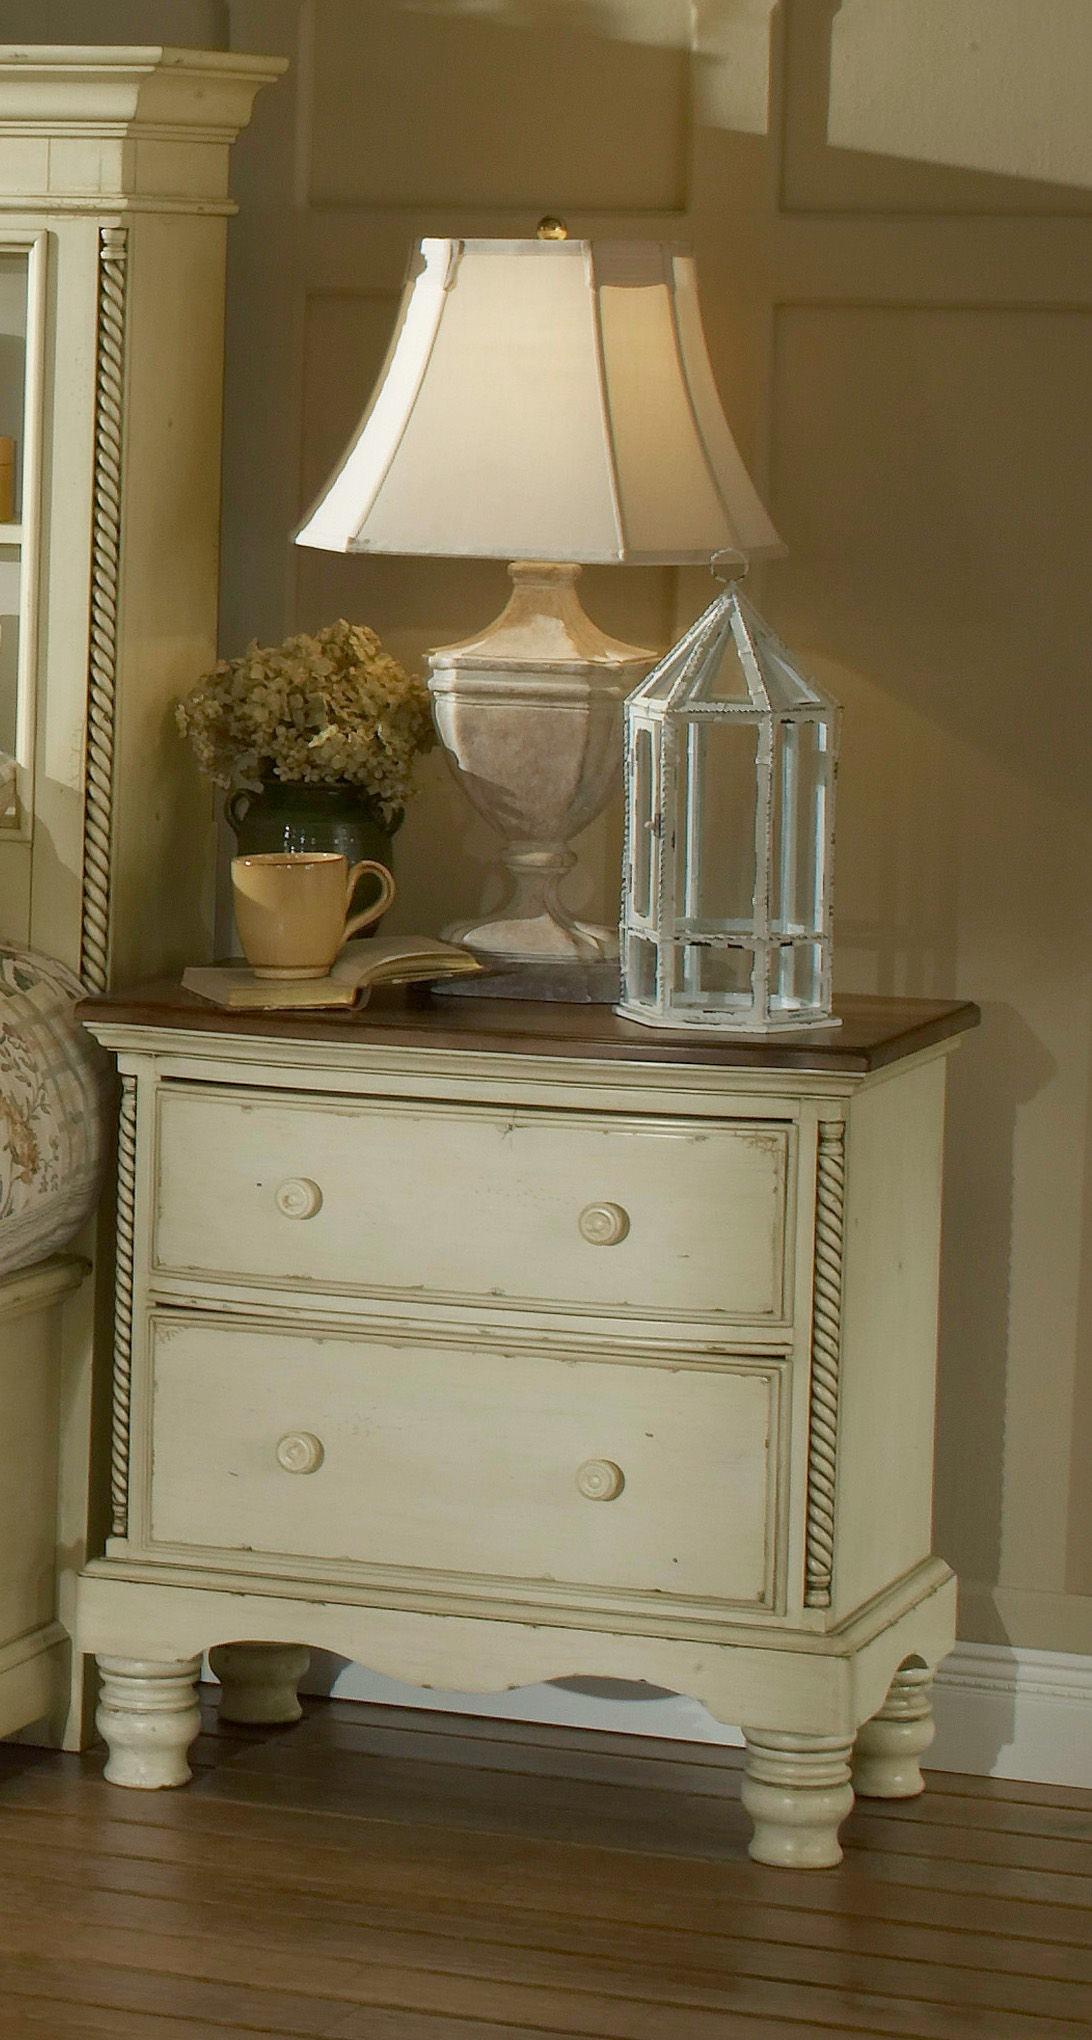 Hillsdale Furniture Bedroom Wilshire Panel Storage Bed King Rails Nightstand Dresser